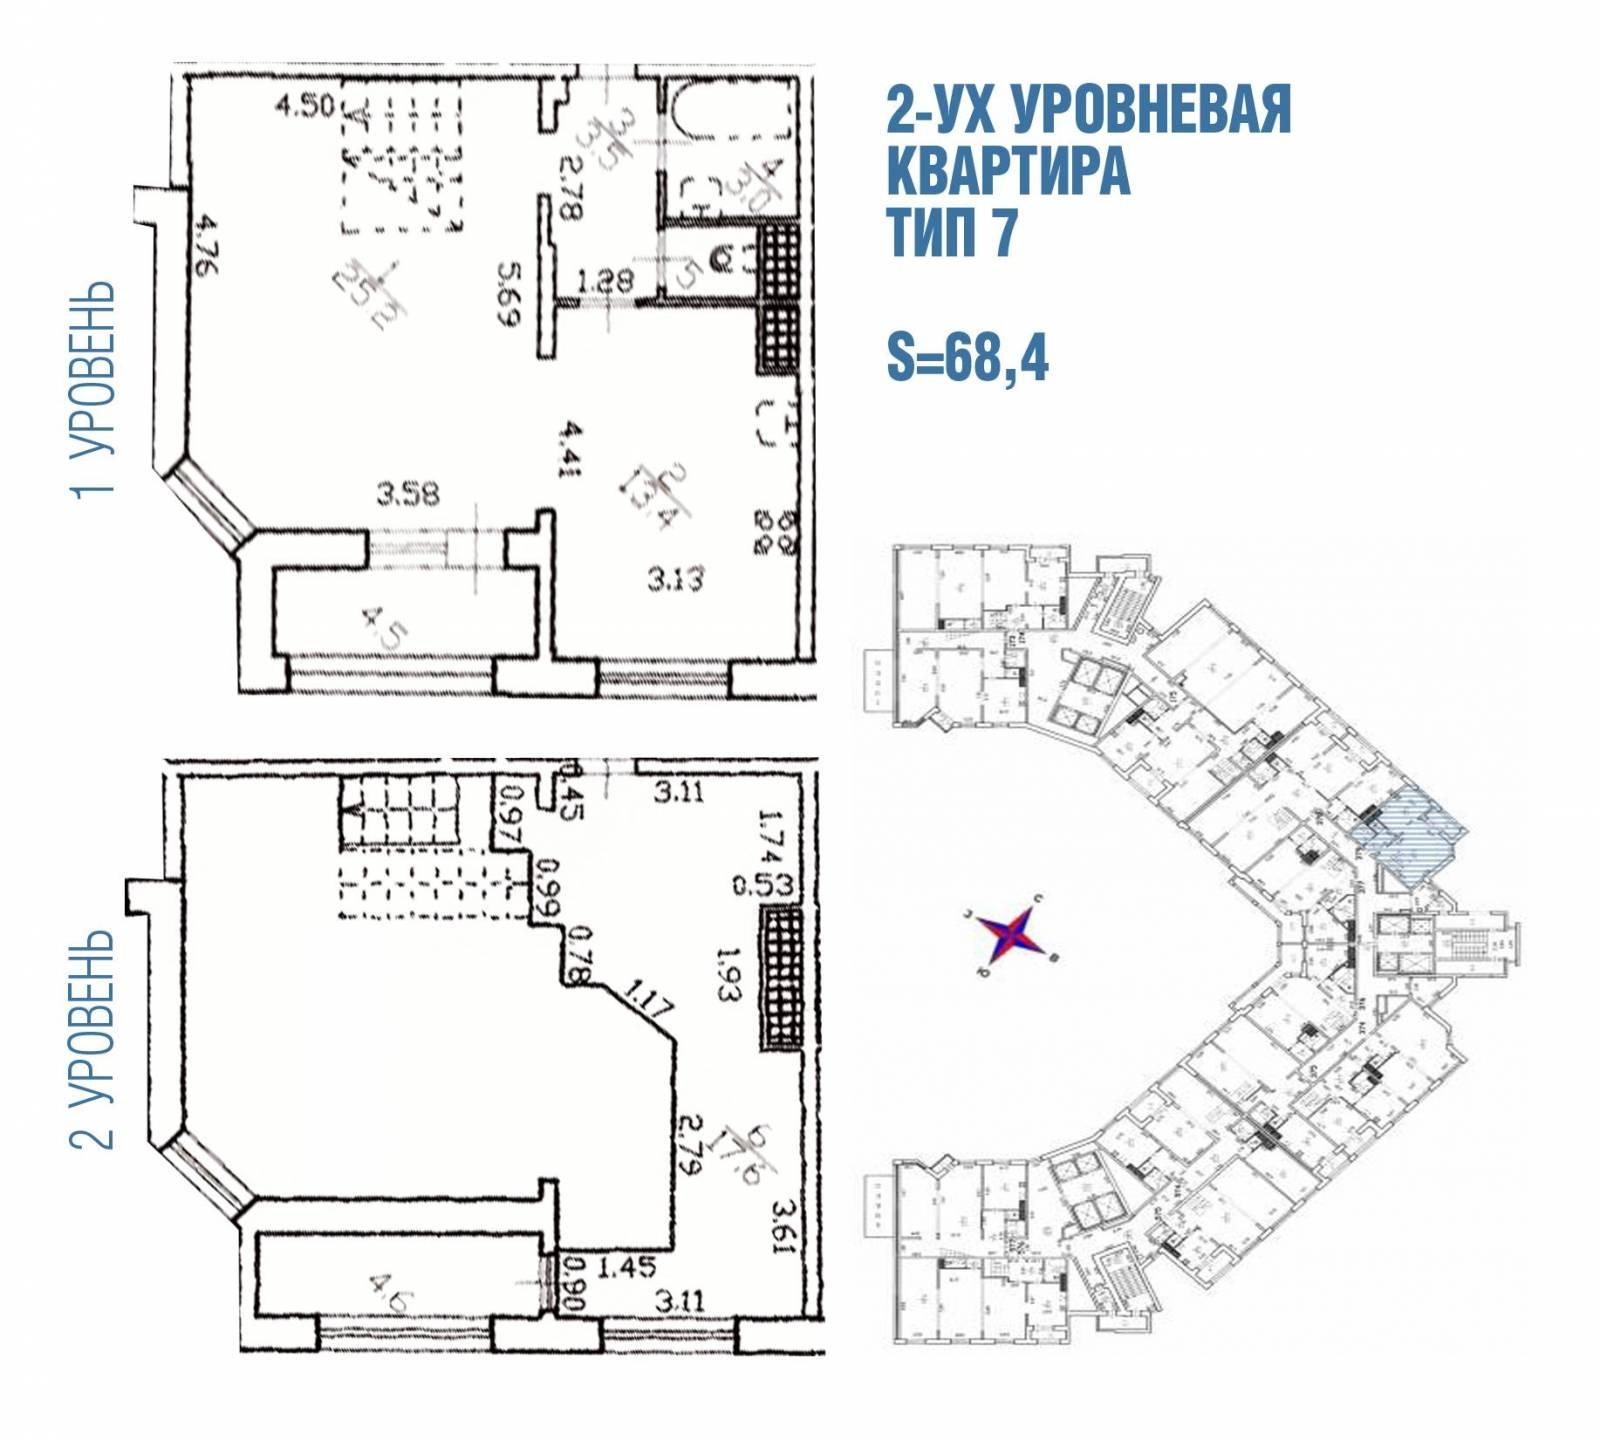 Двухуровневая квартира тип 7 S=68,4